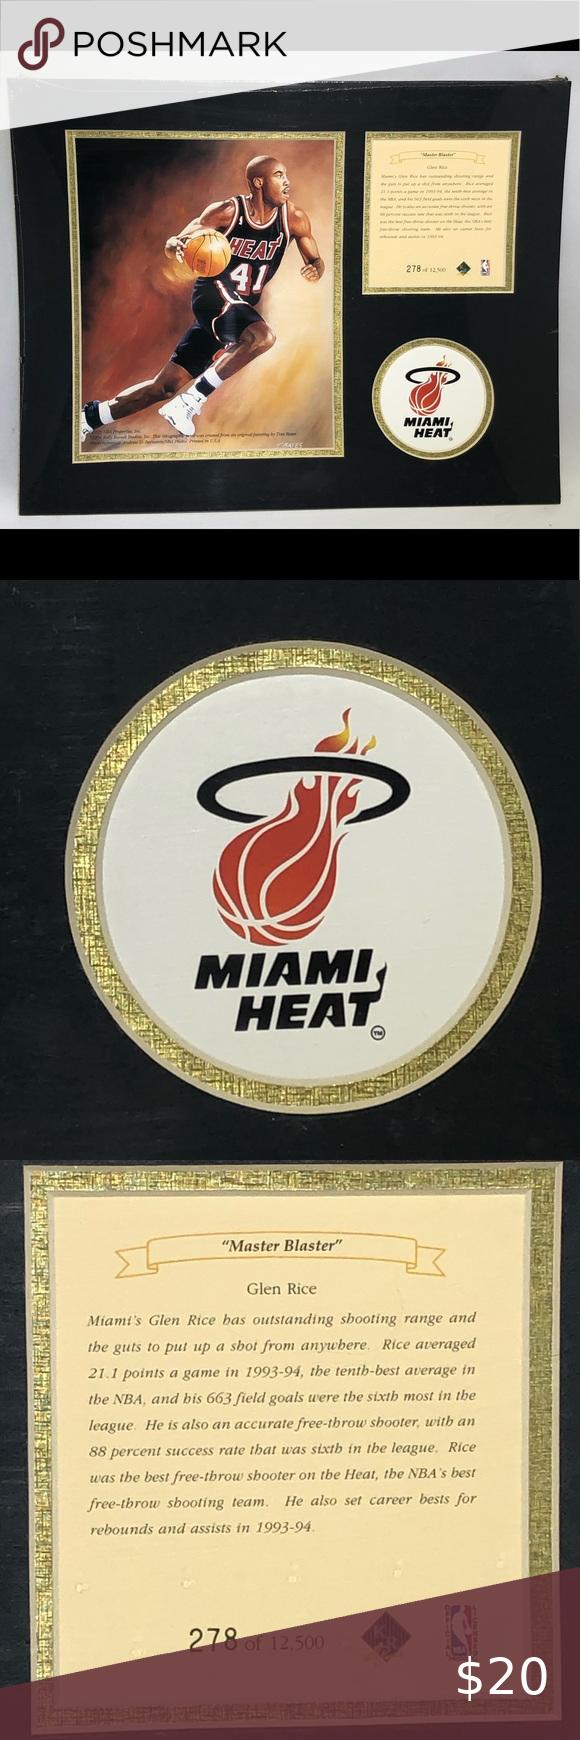 Glen Rice Miami Heat Matted Lithograph Art Print 1995 Glen Rice Miami Heat Unframed Matted Kelly Russell Studios Nba Limited Ed In 2020 Miami Heat Glen Rice Field Goal